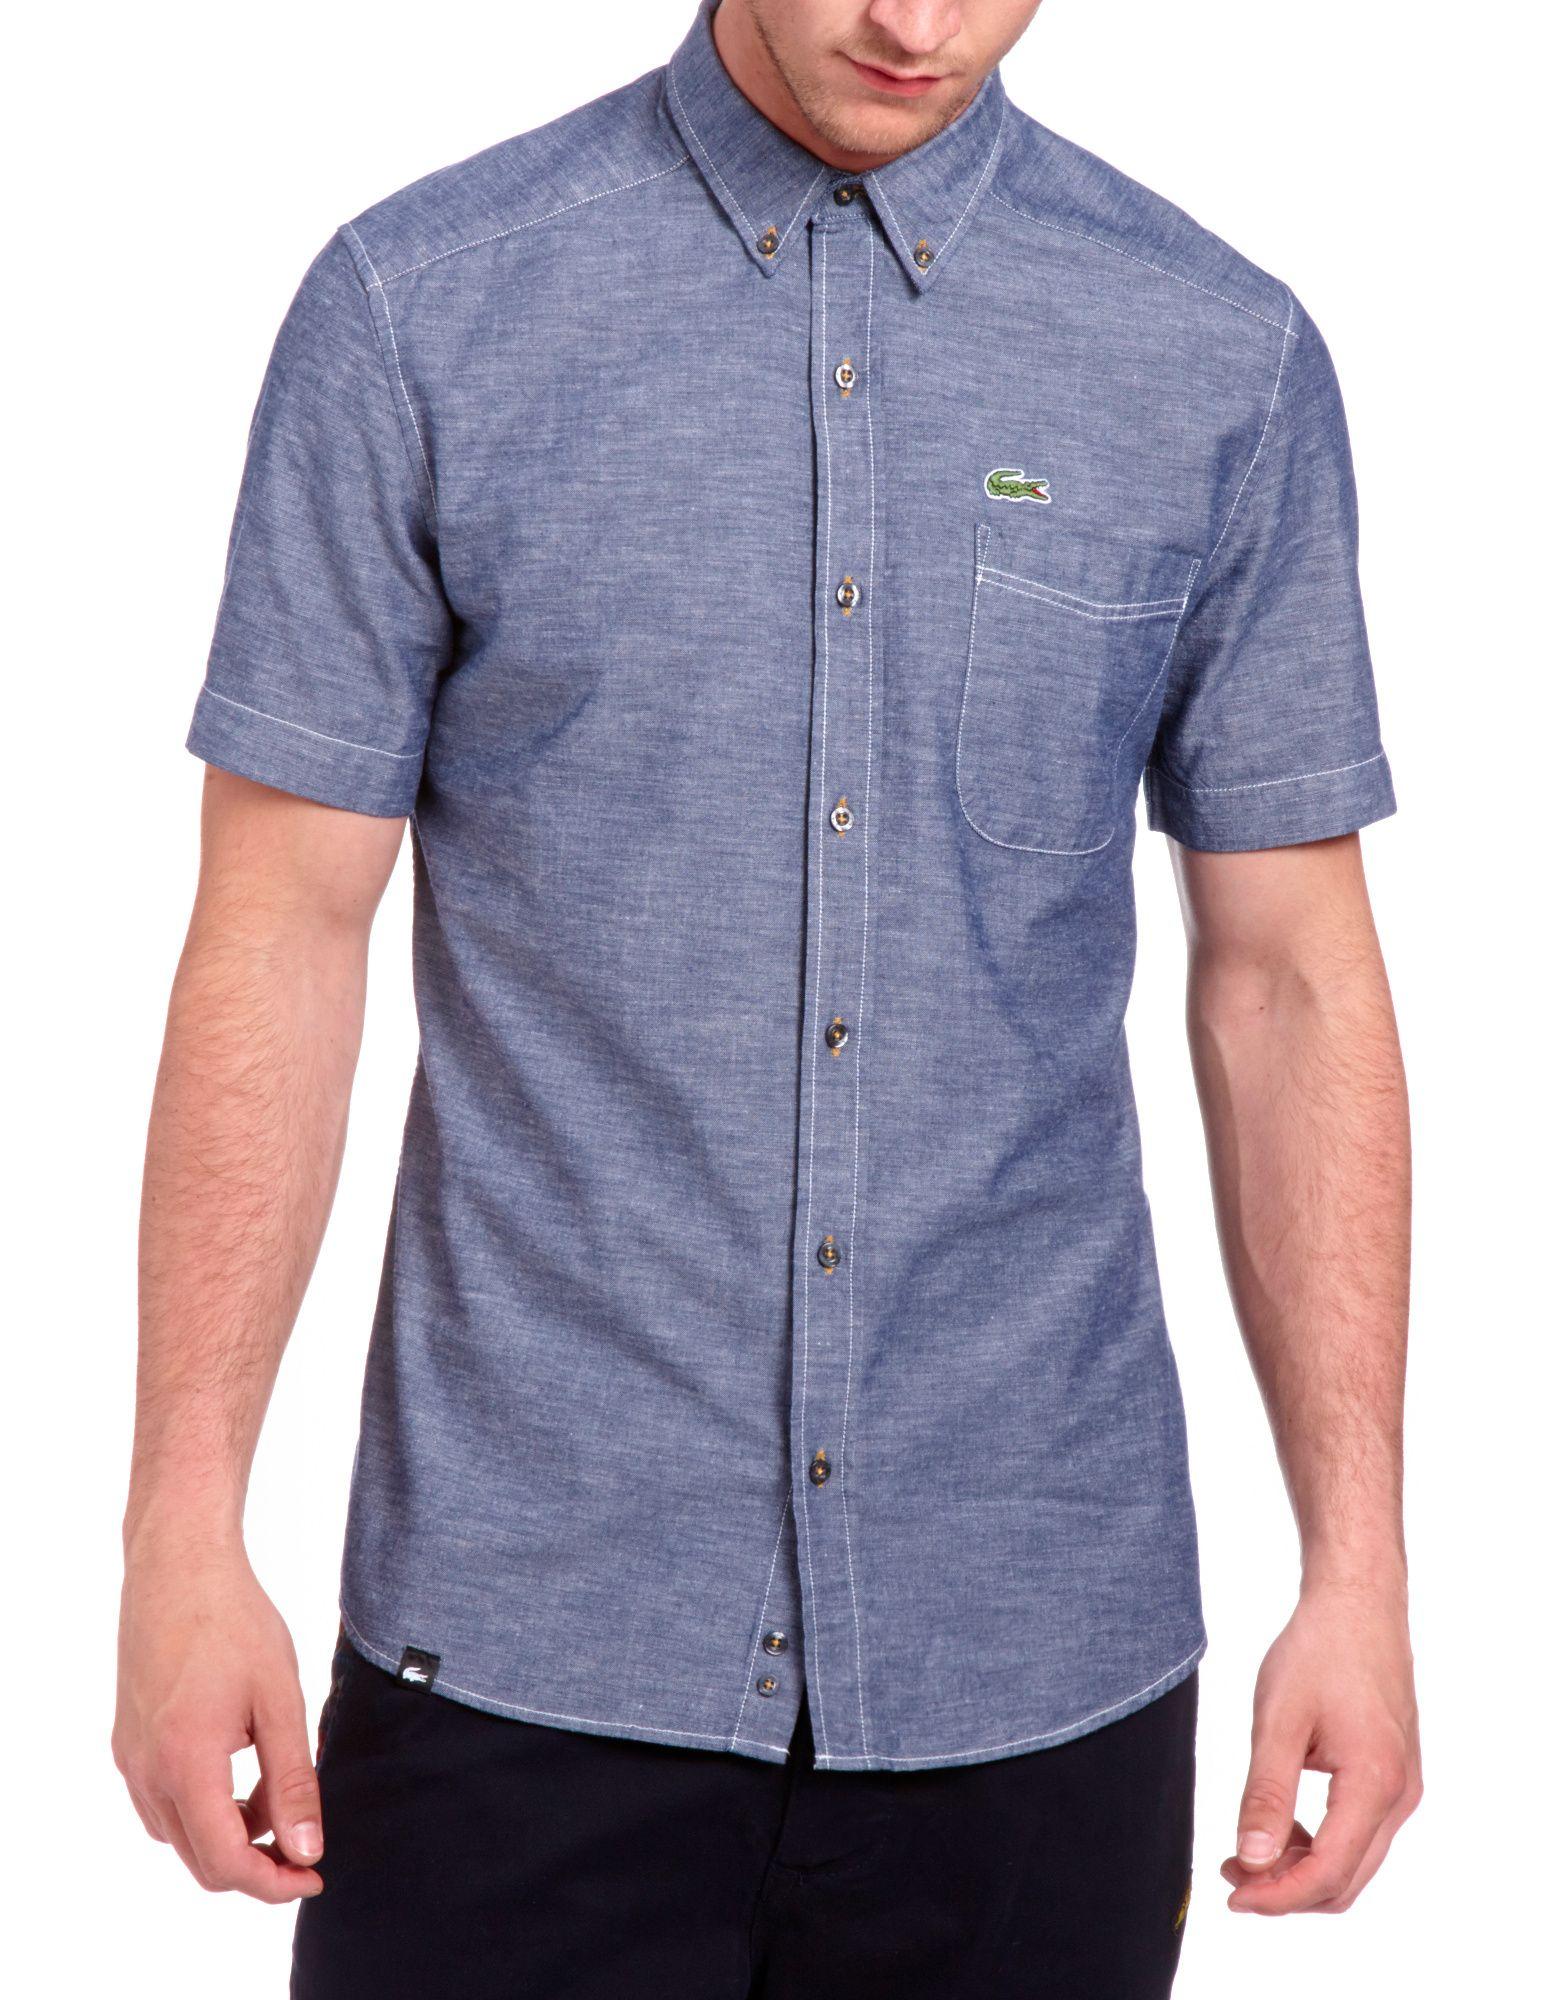 Lacoste Plain Pocket Shirt